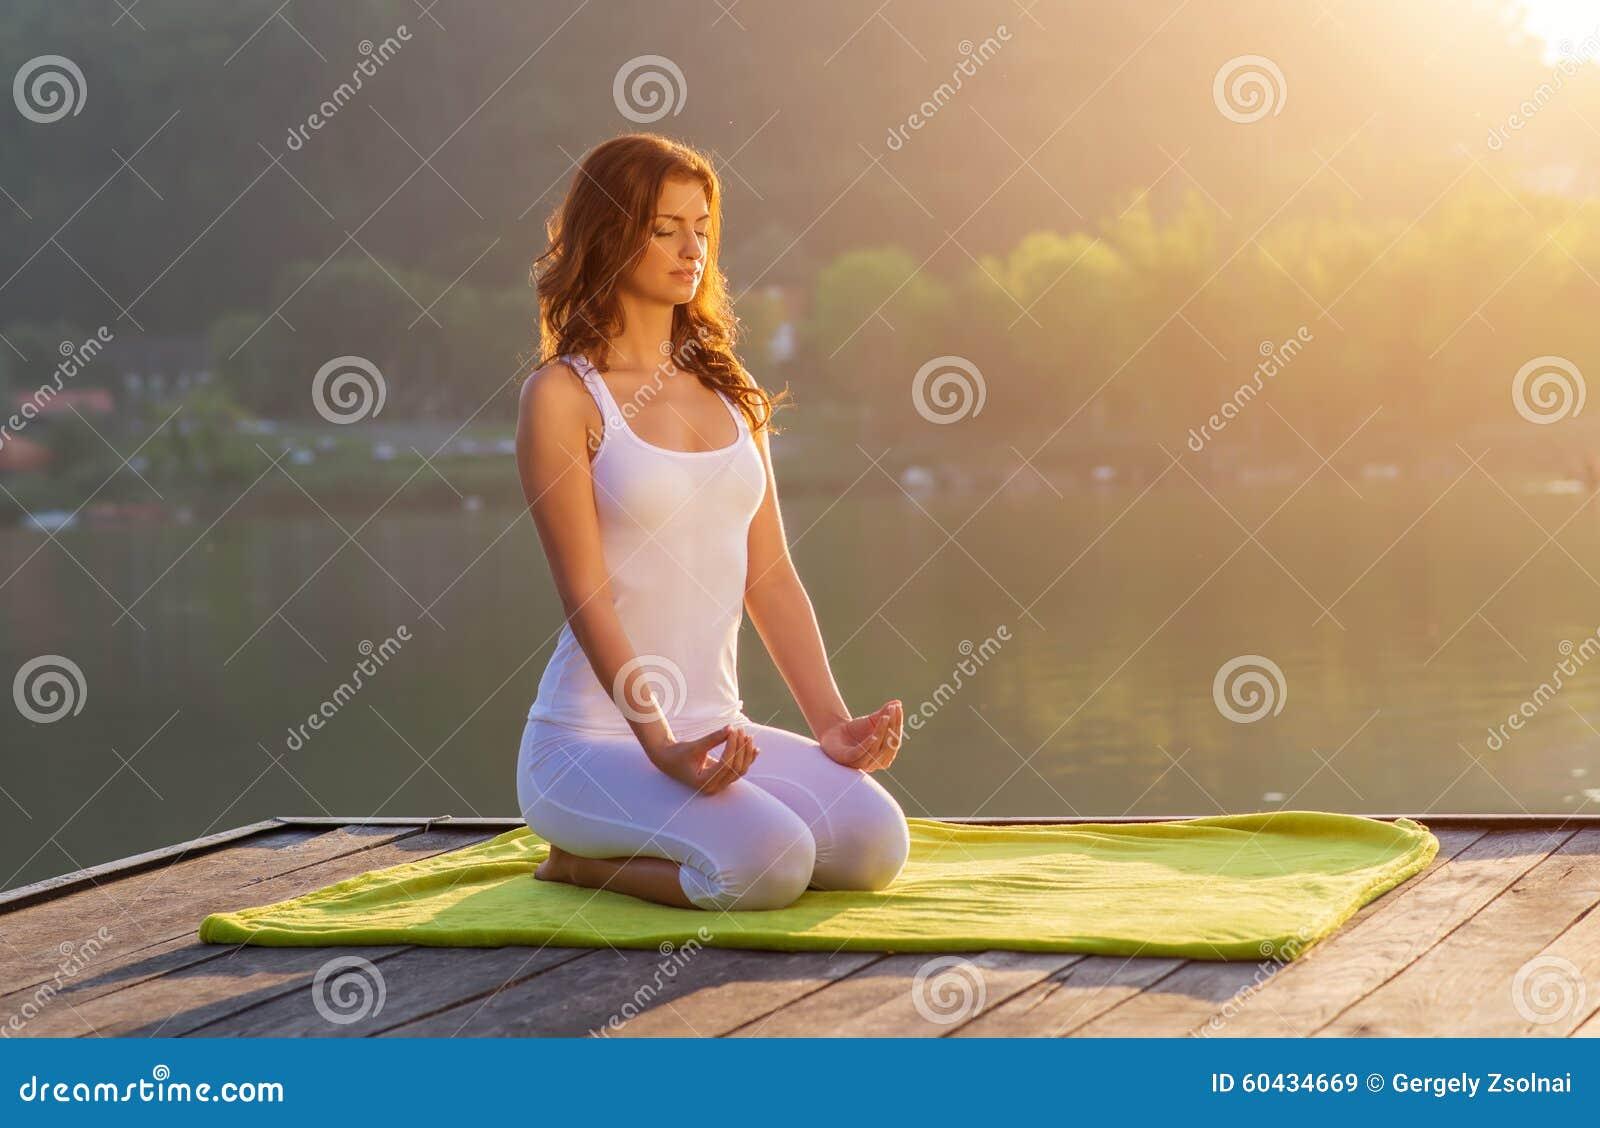 Woman doing yoga on the shore - half figure sitting